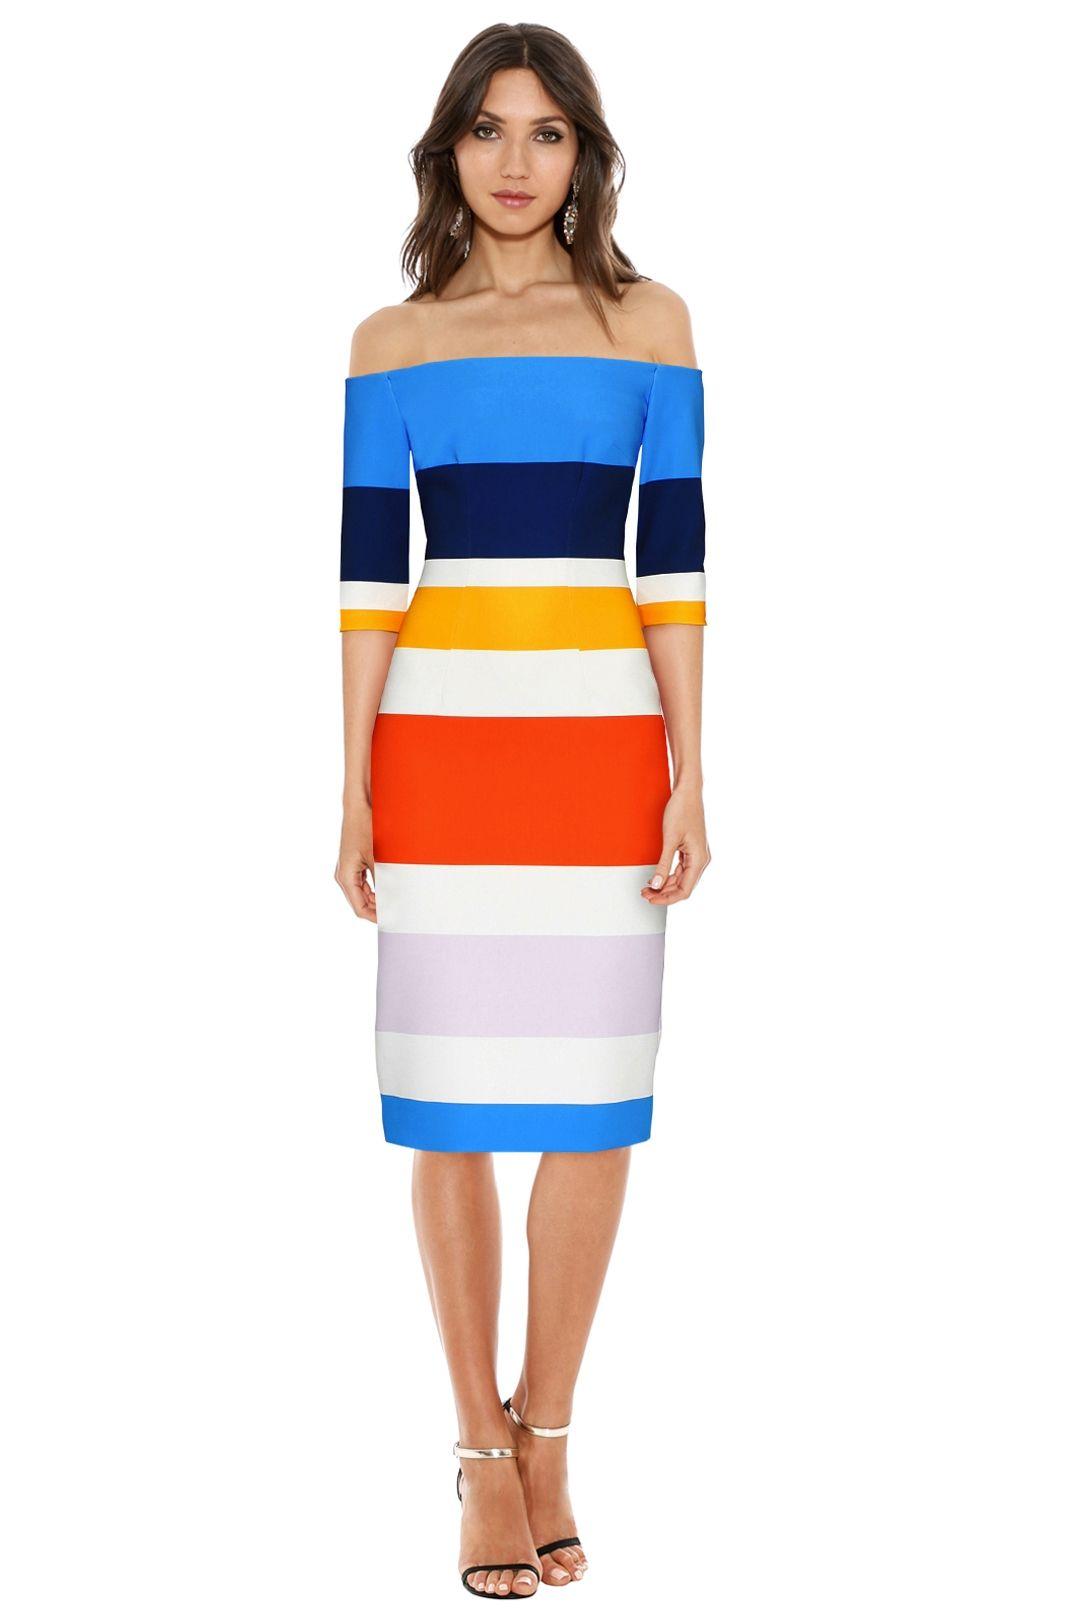 By Johnny - Bermuda Stripe Cut Off Dress - Multicolour - Front